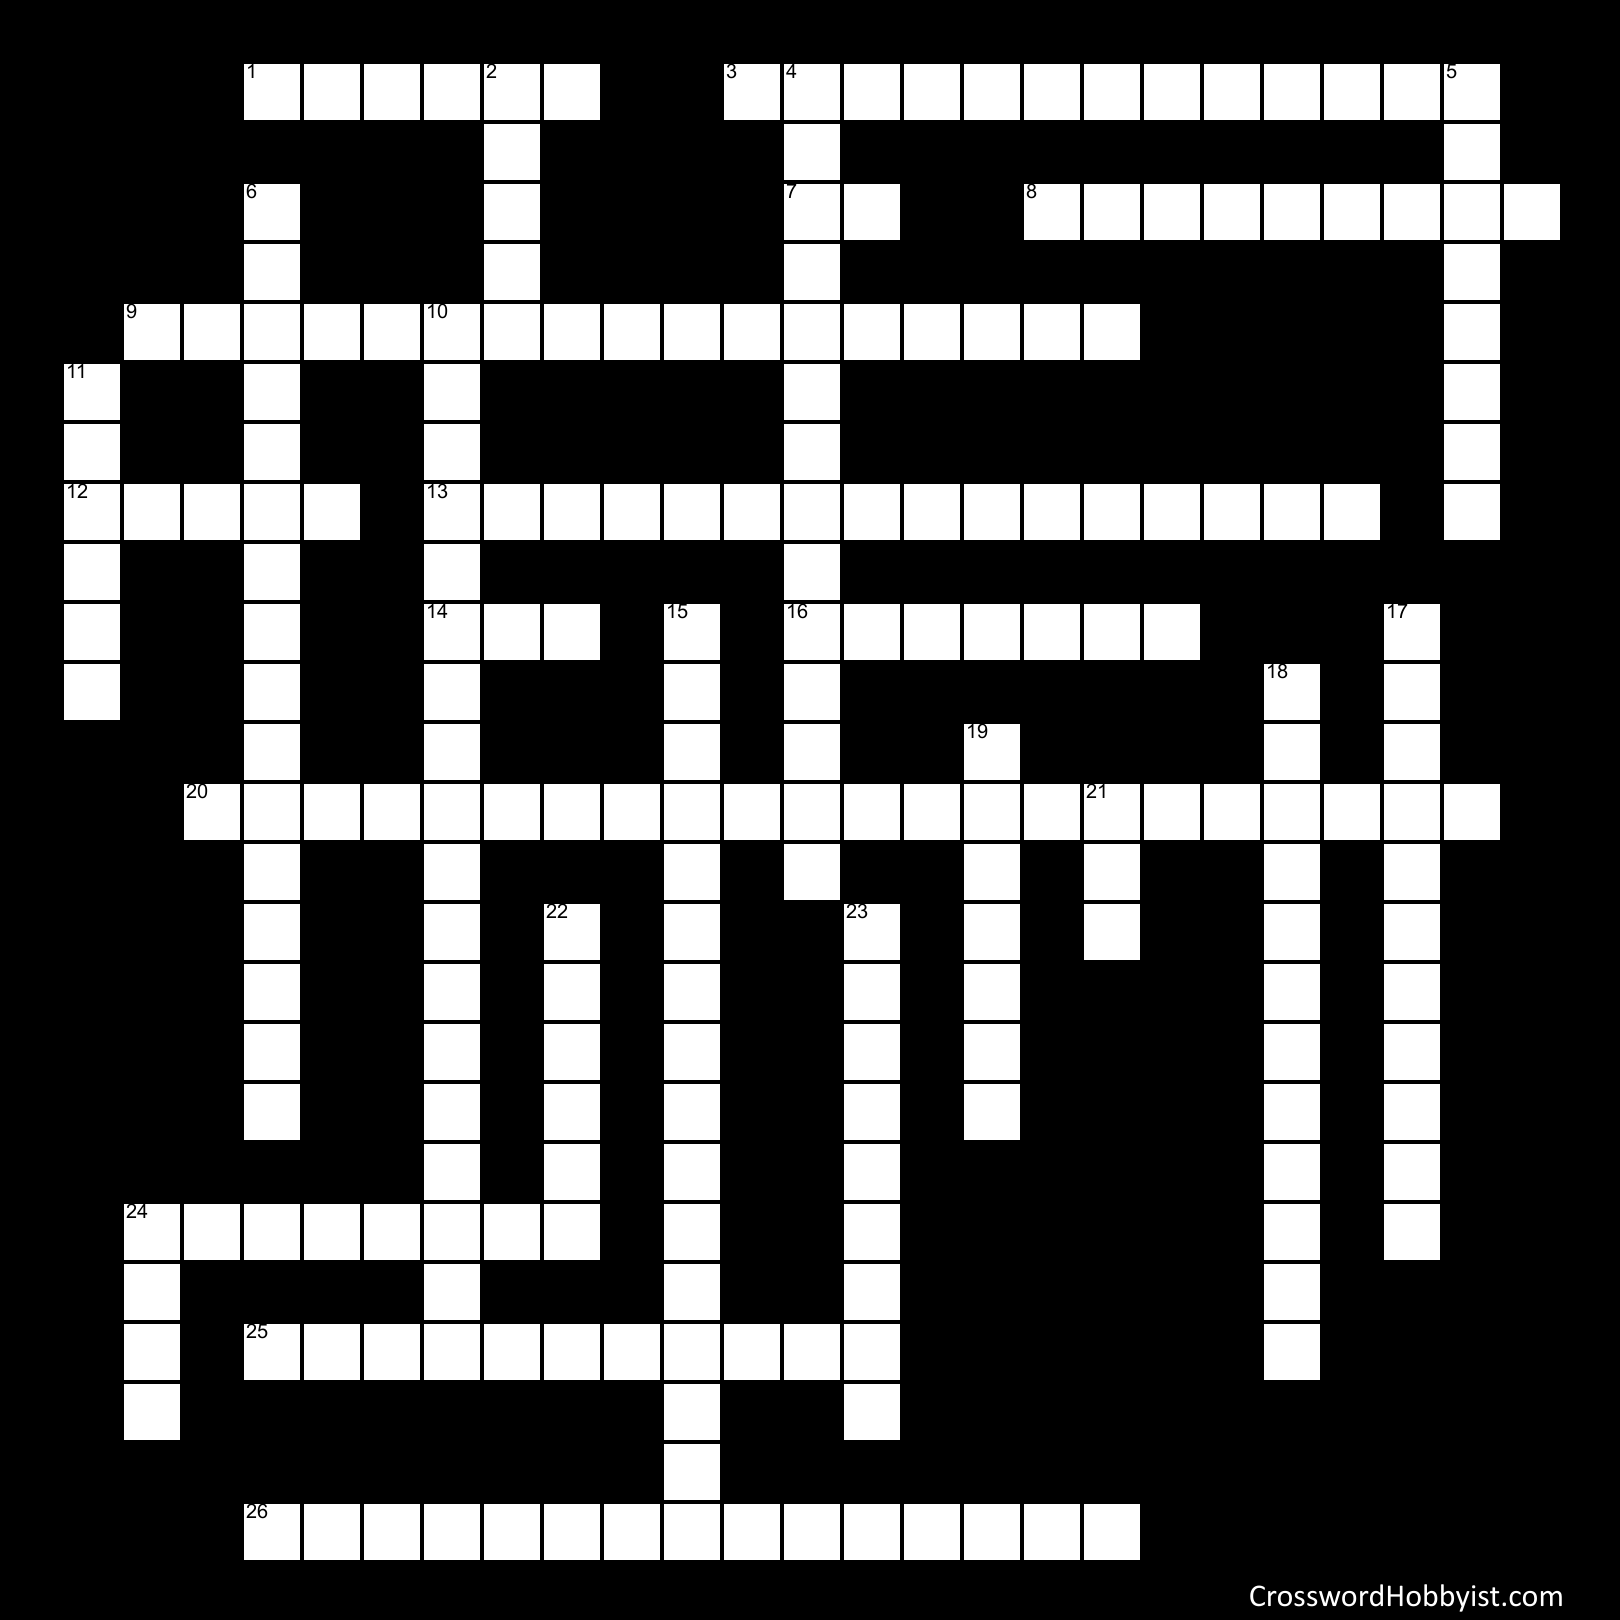 EXECUTIVE BRANCH CROSSWORD PUZZLE - Crossword Puzzle